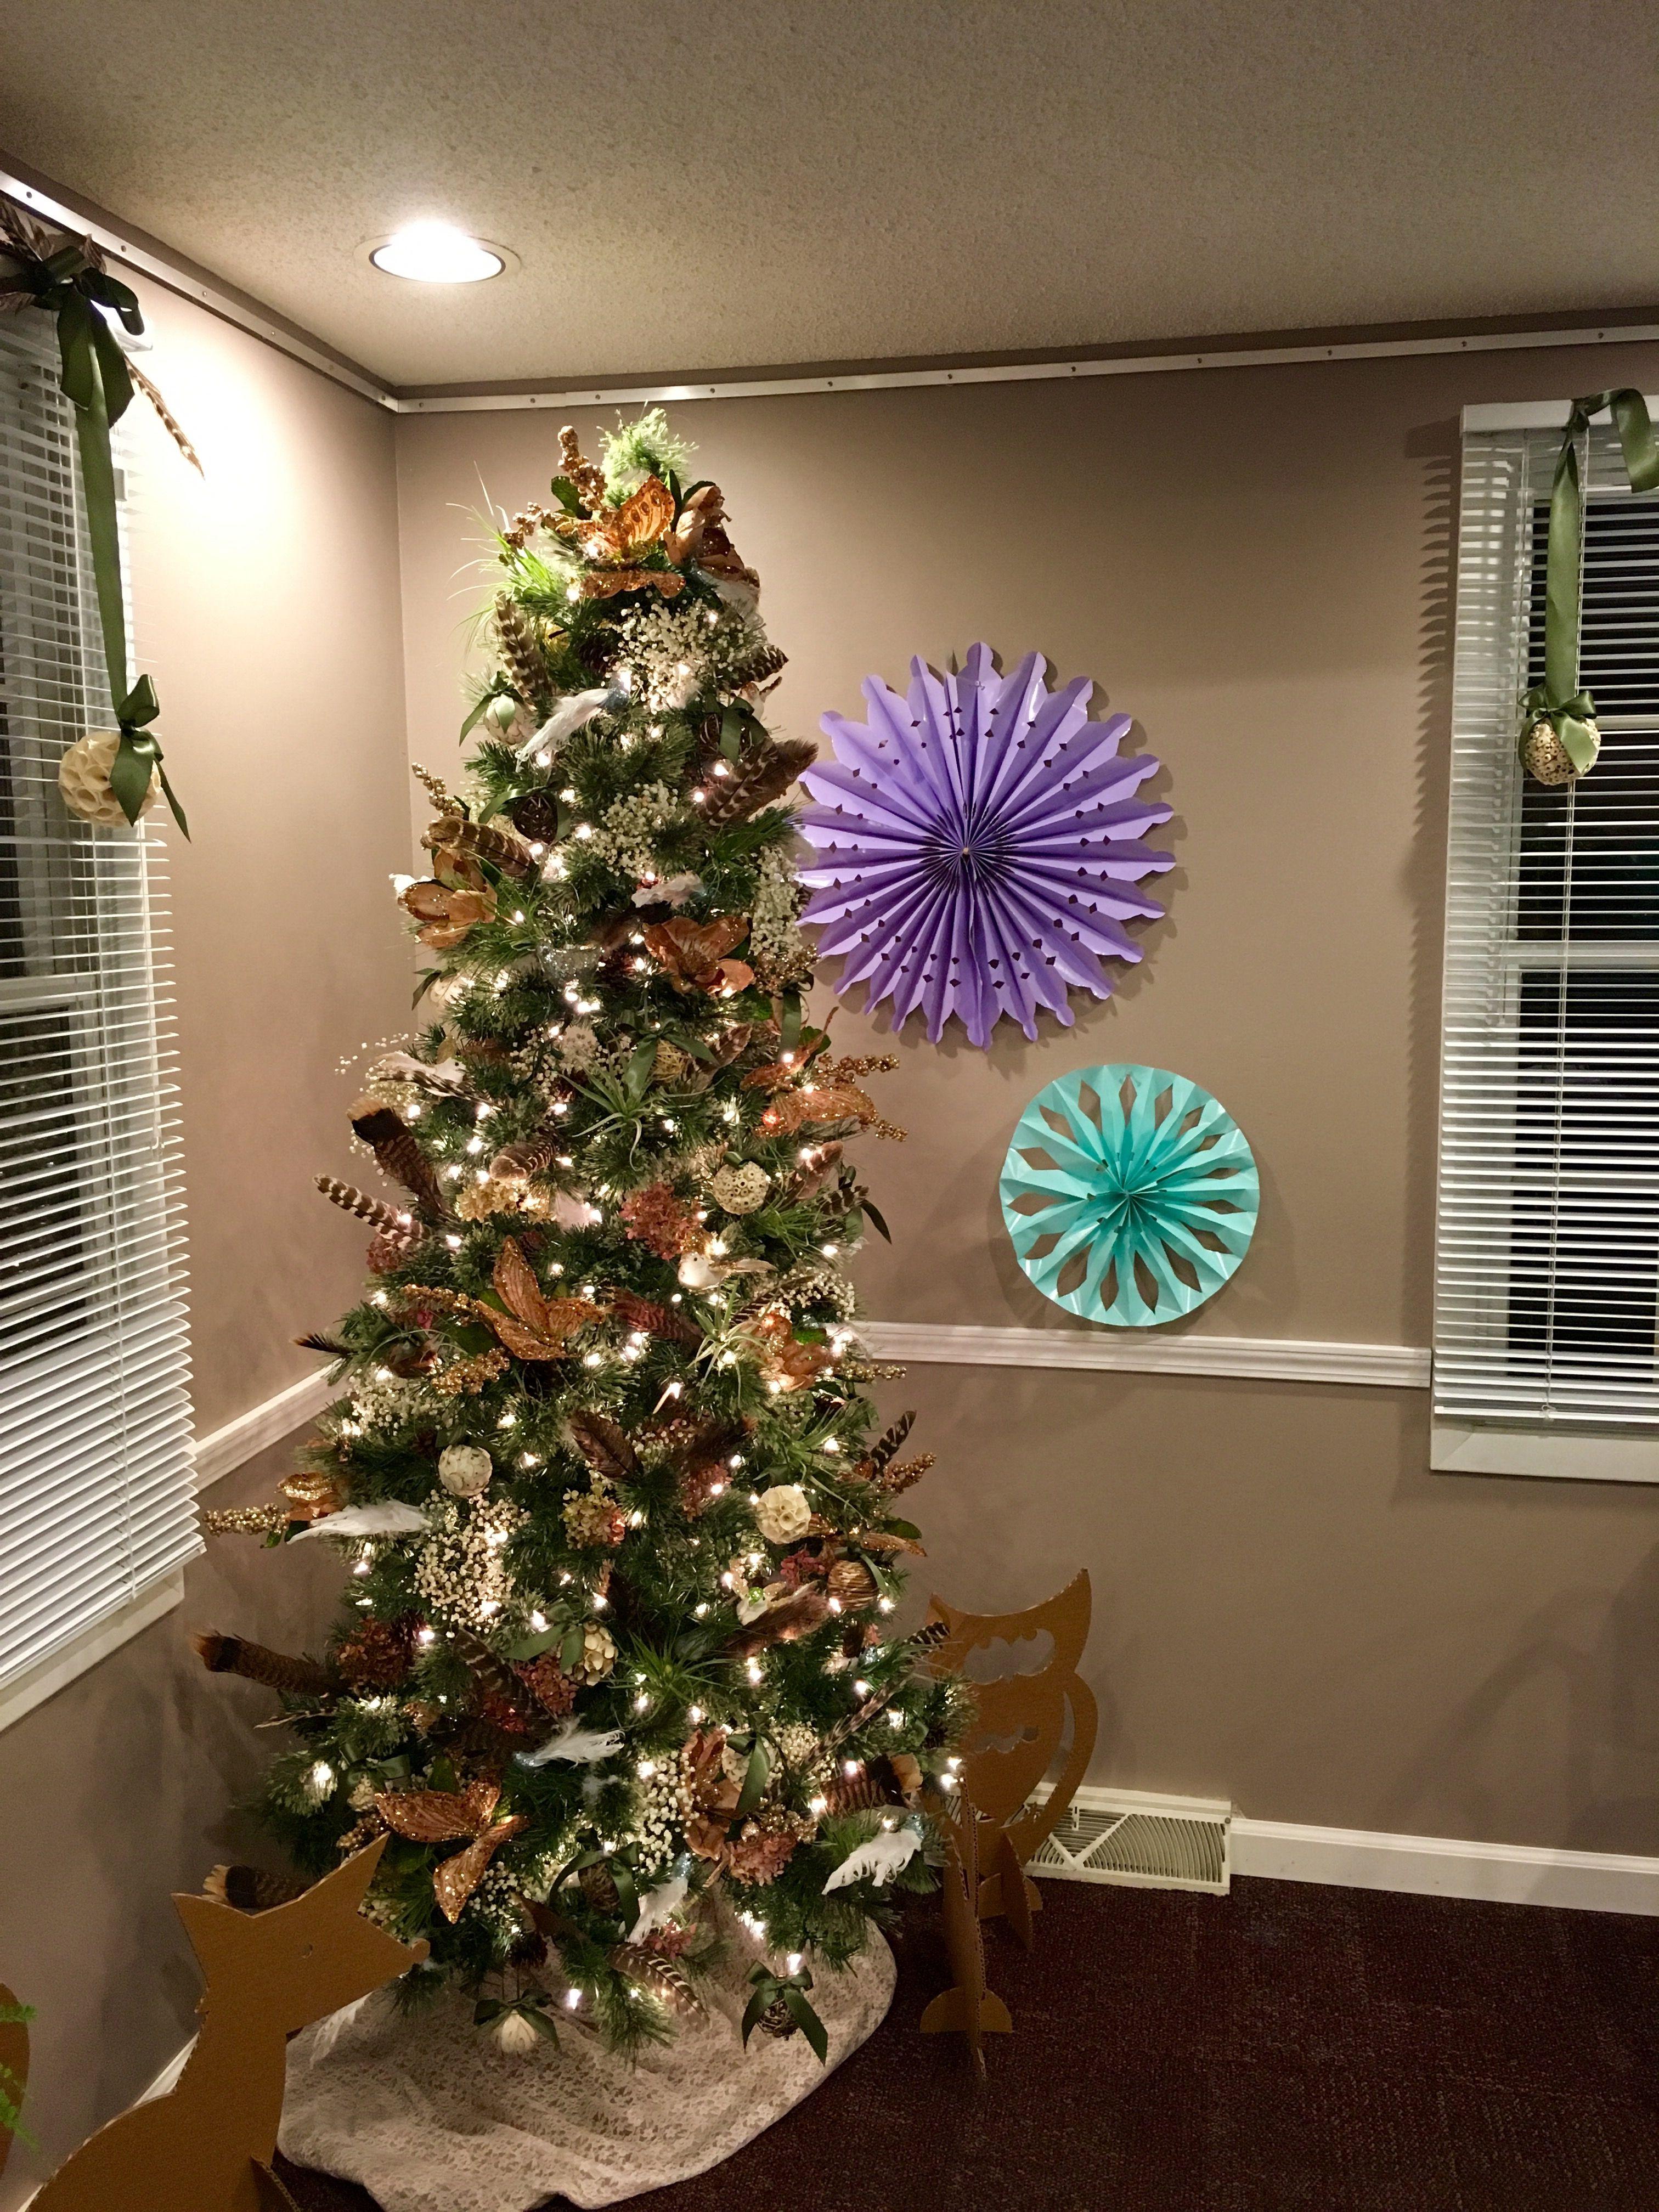 norfolk pine christmas tree - econhomes.com